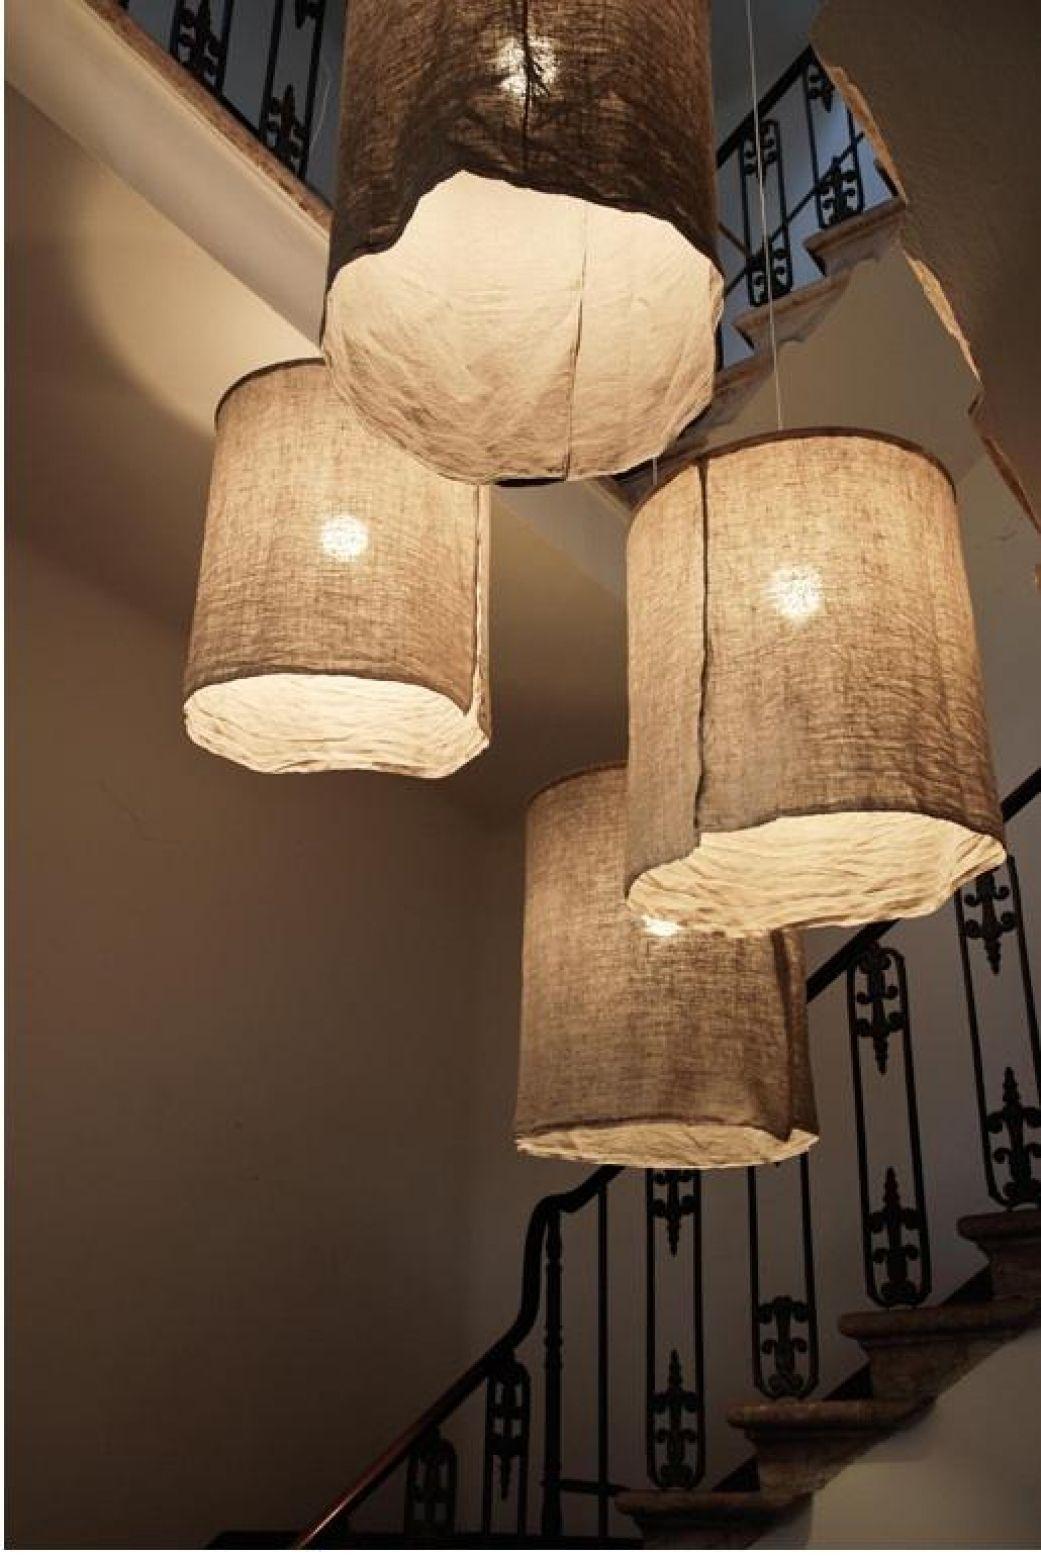 Creative 15 Chic And Creative Recycled Lamp Shade Diy